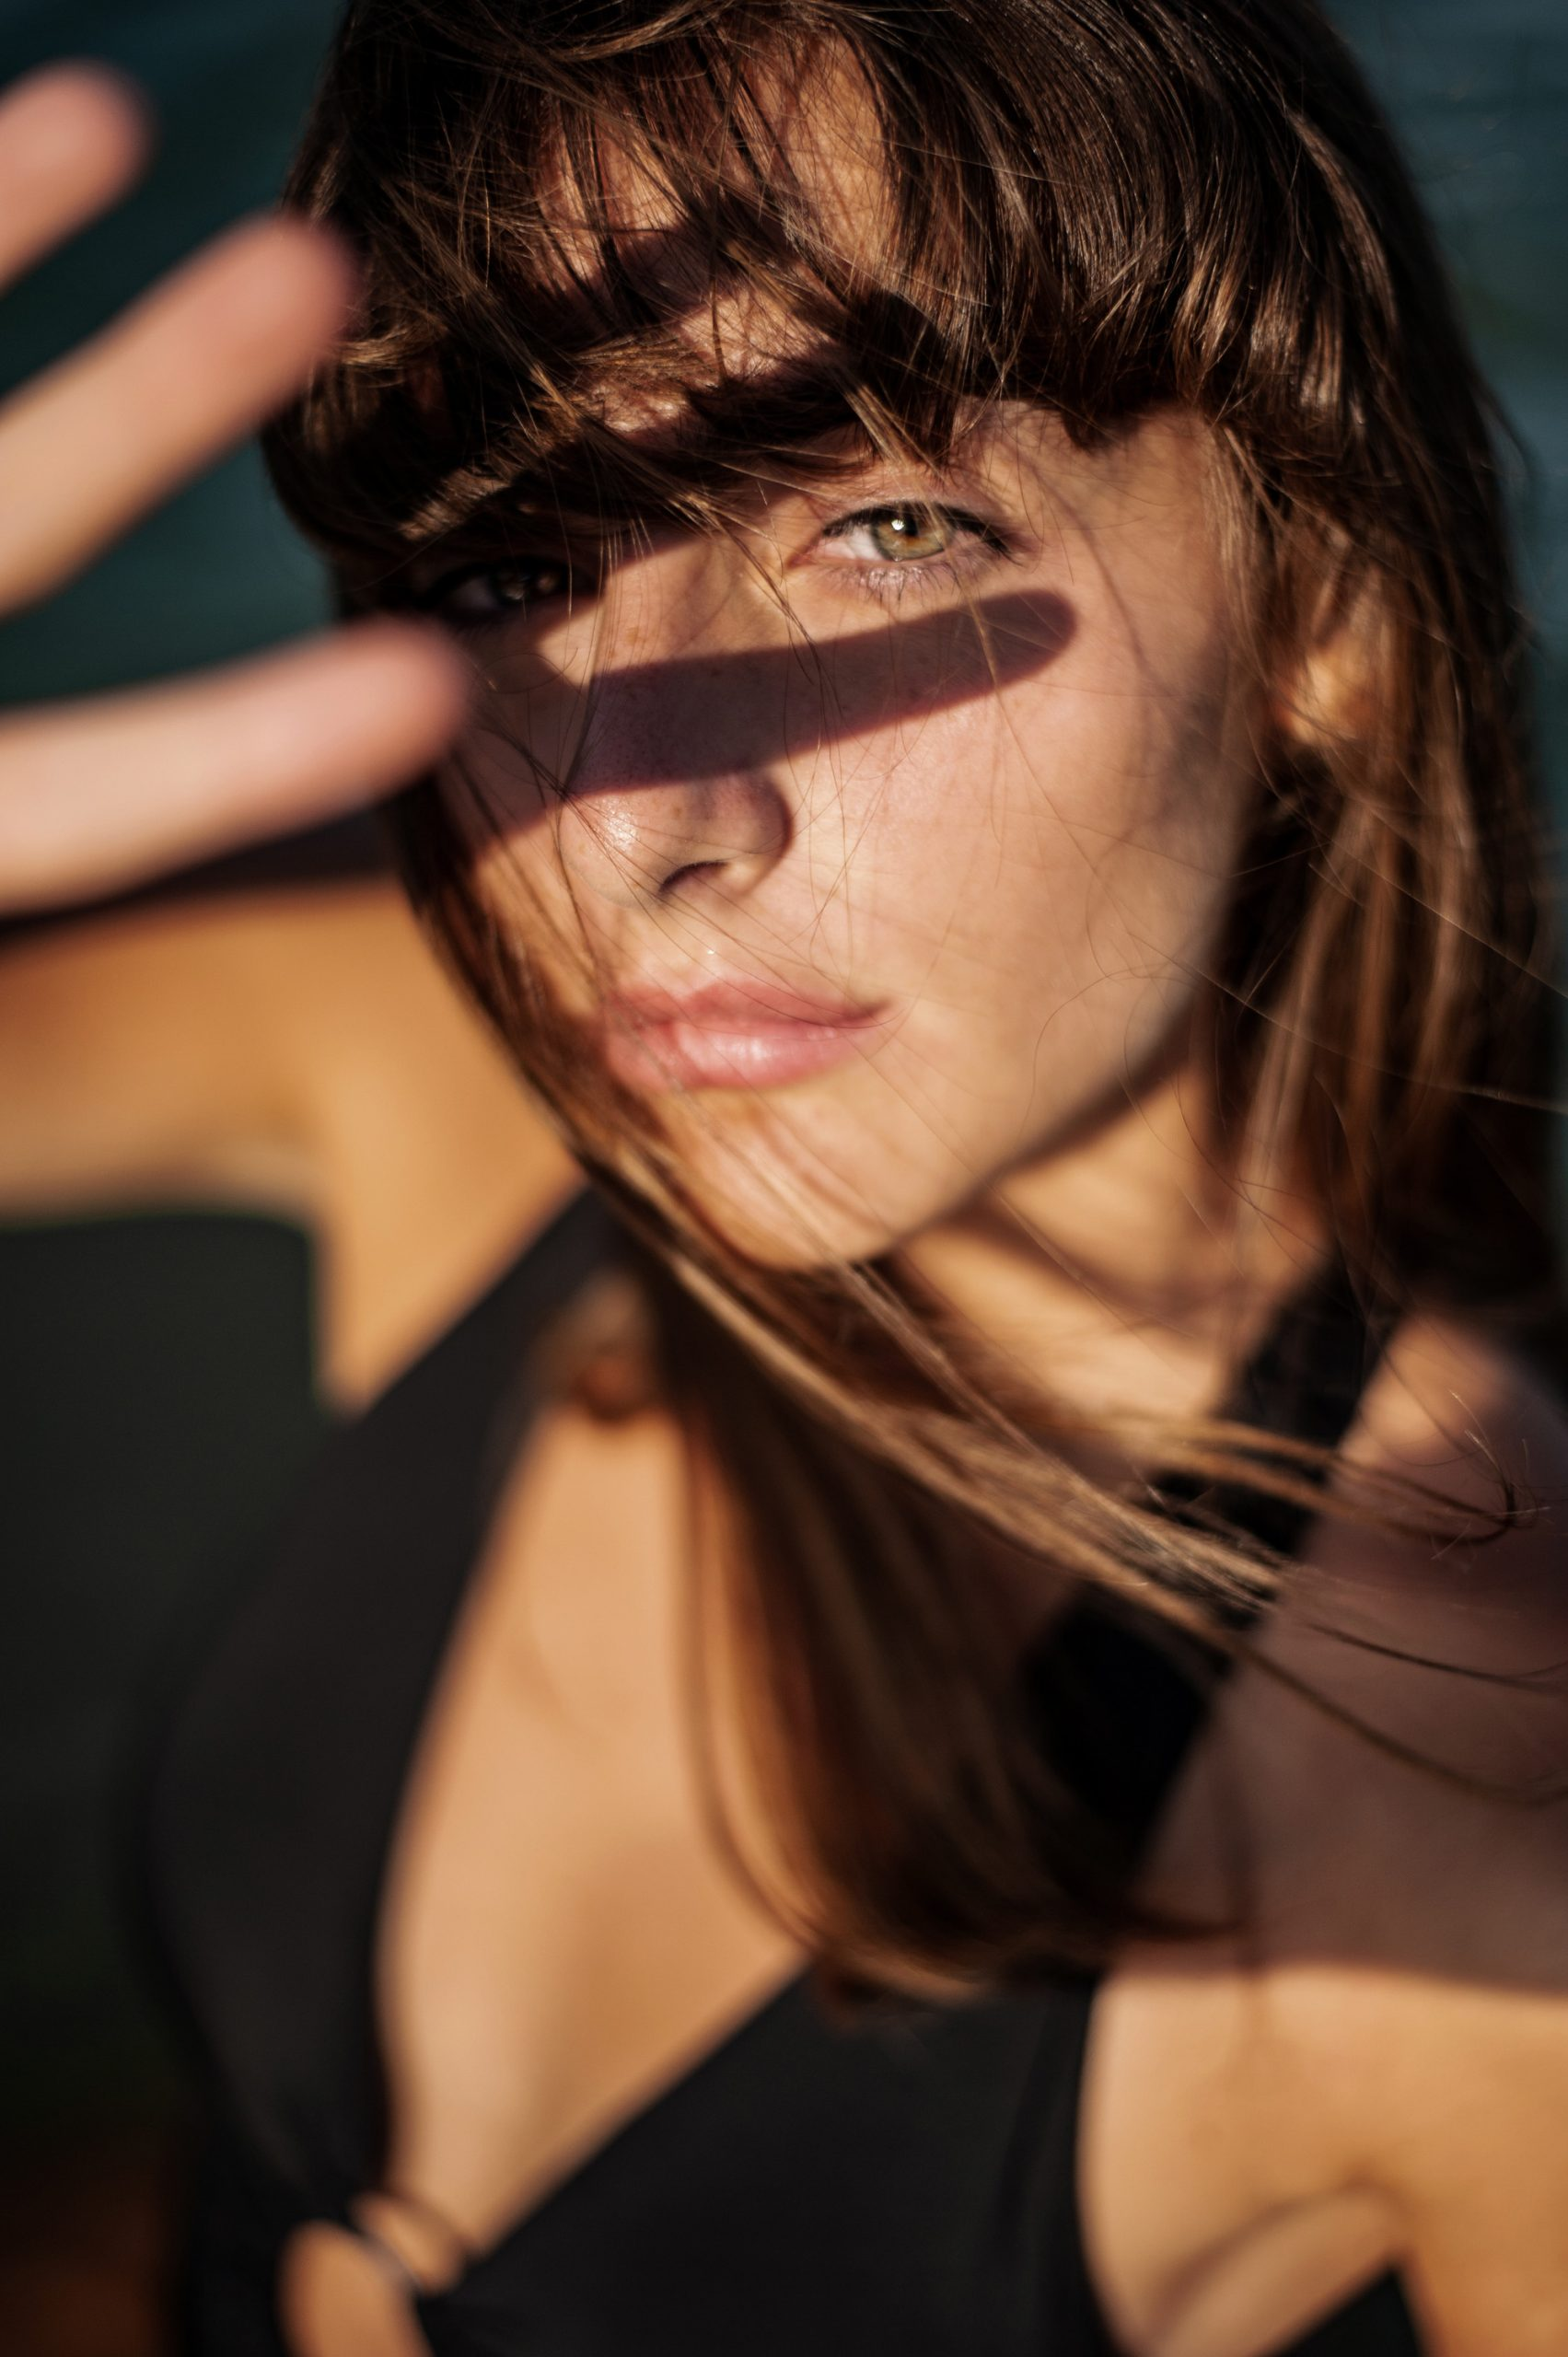 Categorie: Glamour, Portrait - Photographer: SAMUELE RIPANI - Model: CLAUDIA VITELLI - Location: Martinsicuro, TE, Italia